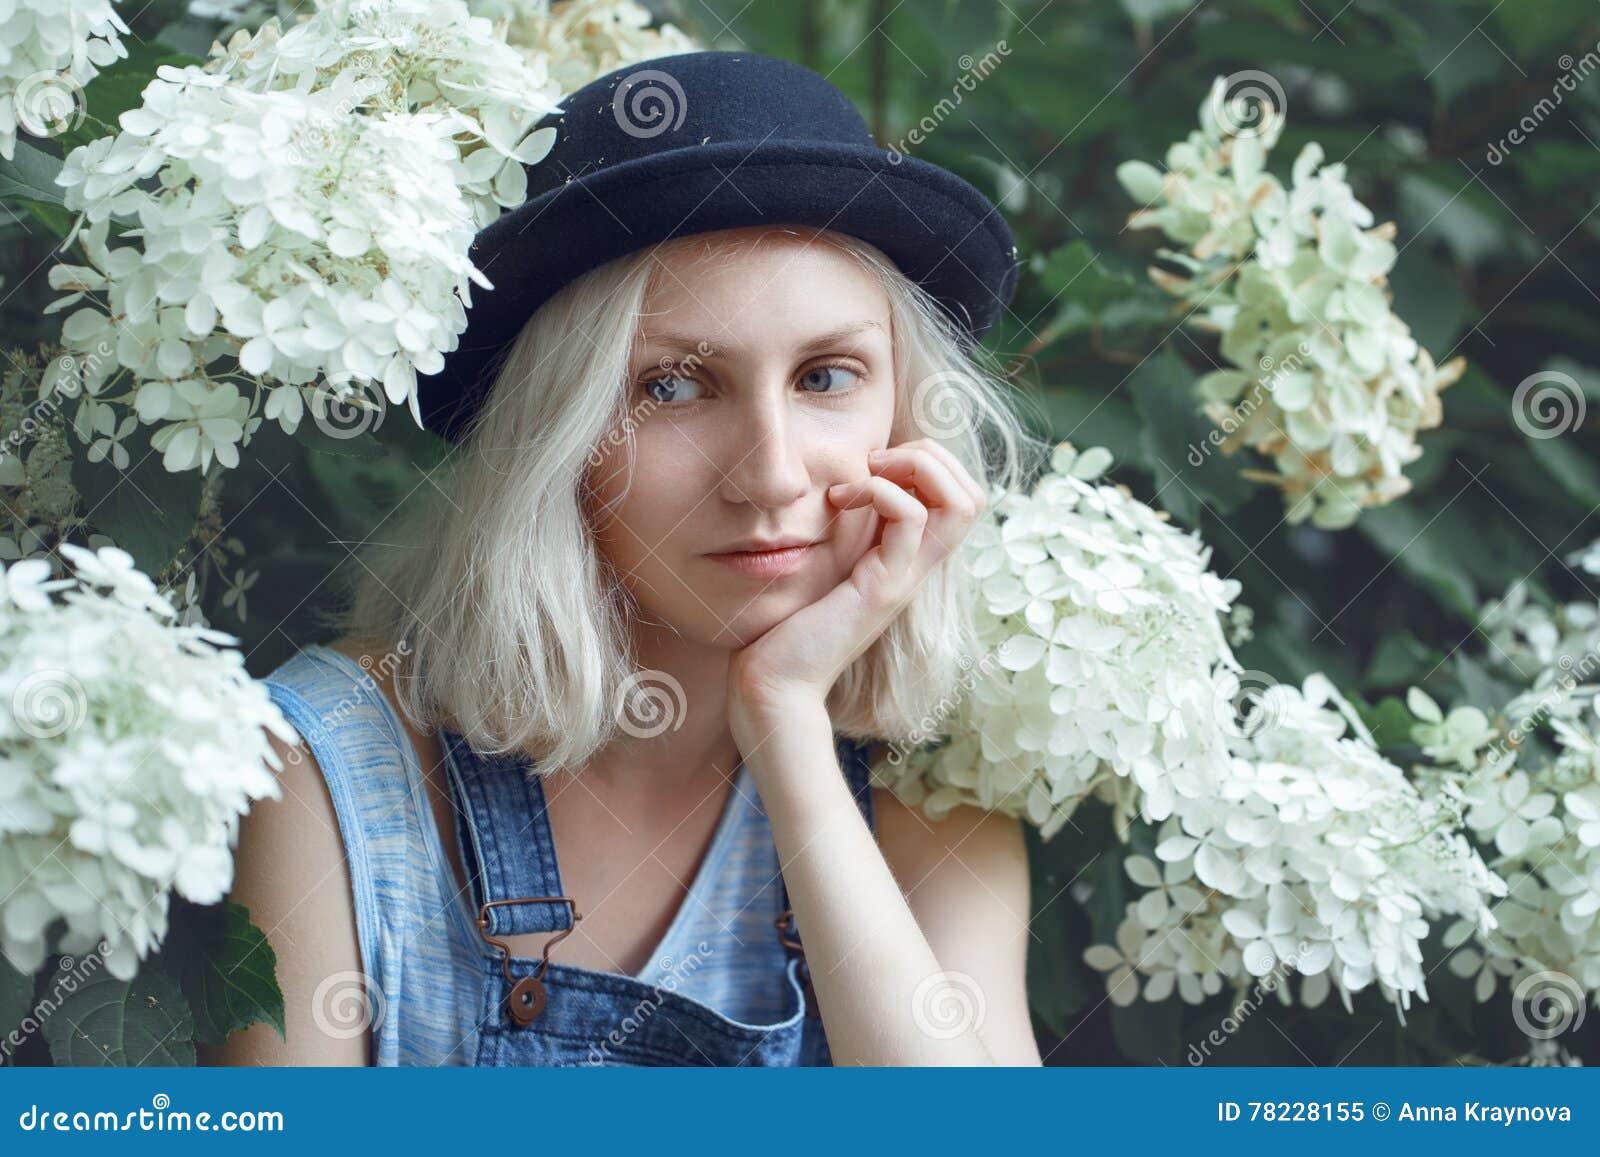 Closeup portrait of beautiful Caucasian teenage young blonde alternative model girl woman in blue tshirt